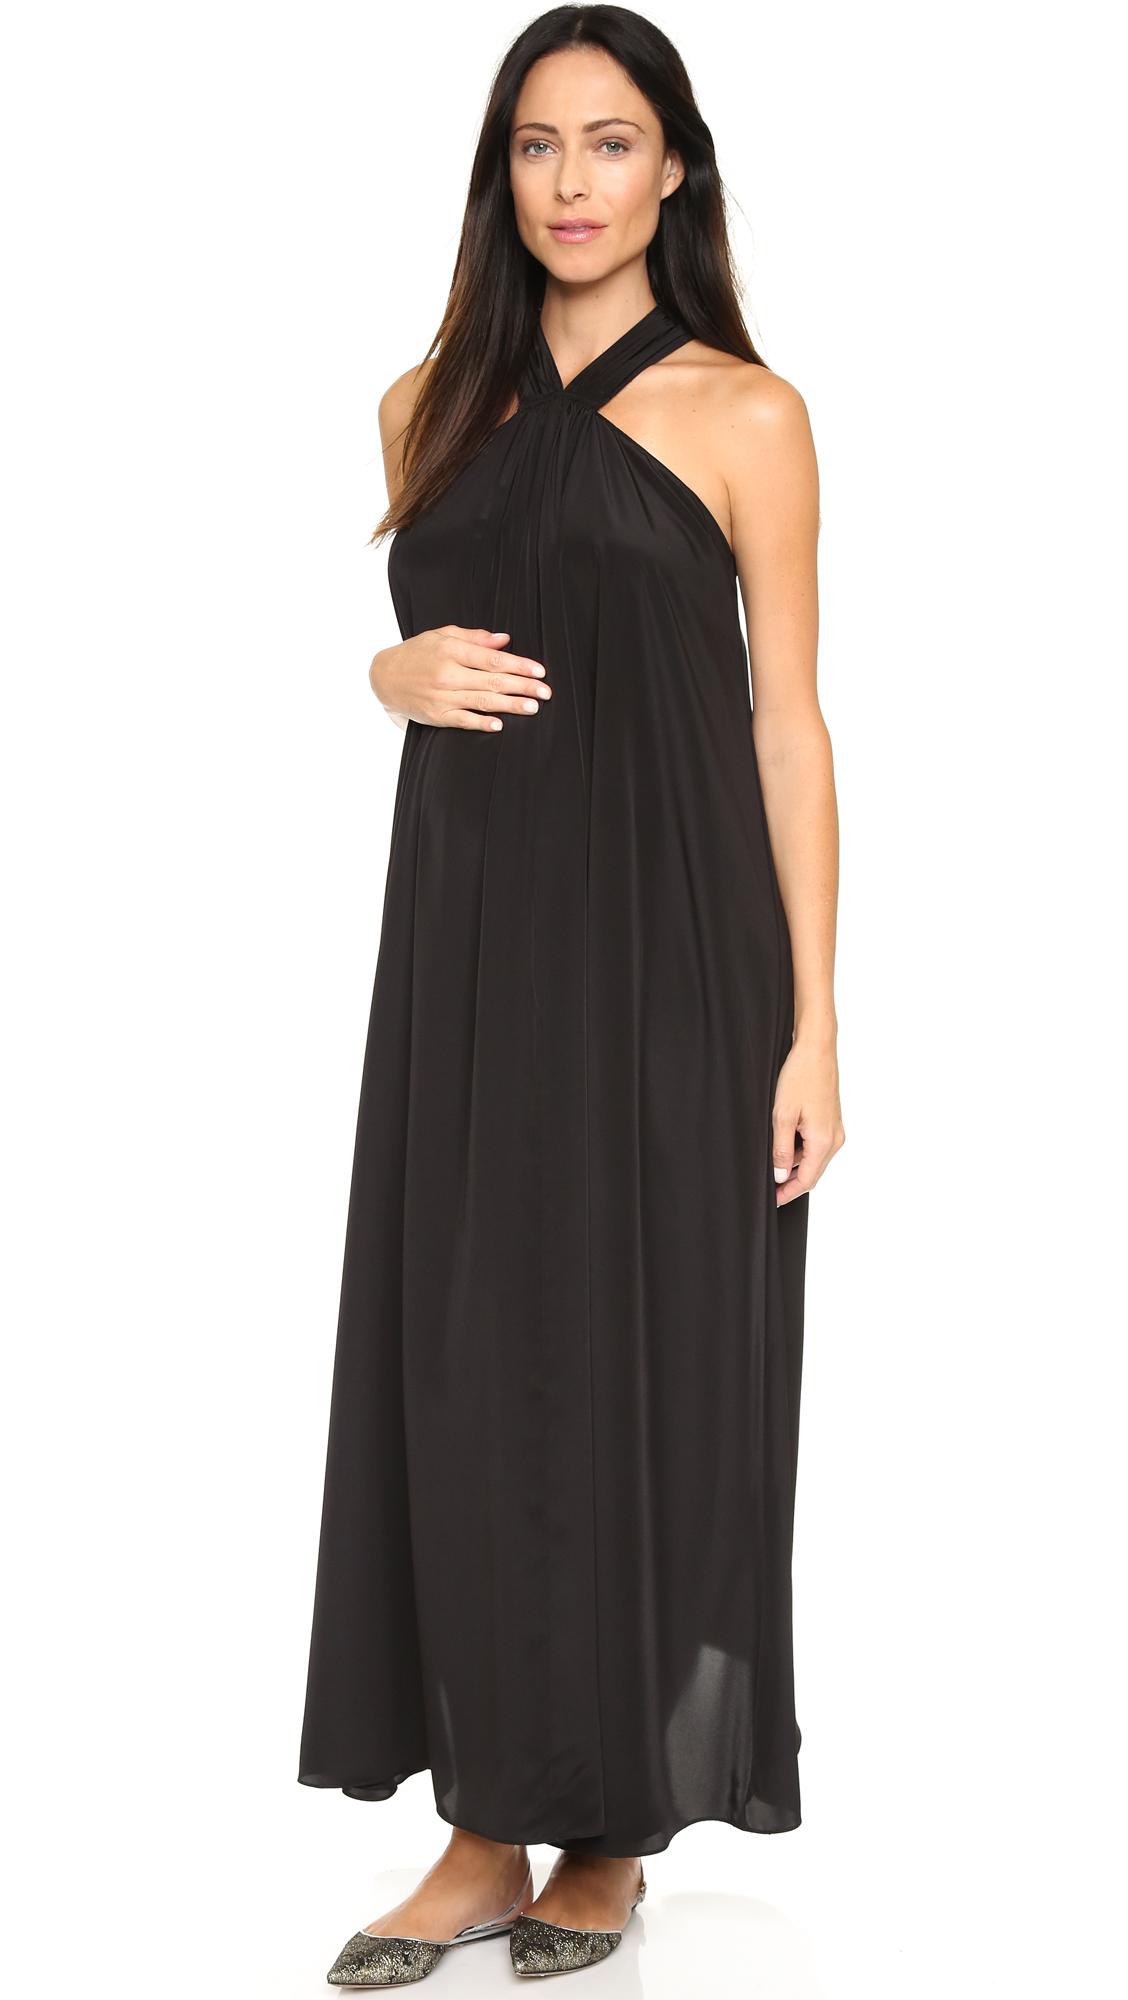 HATCH The Fete Gown - Black